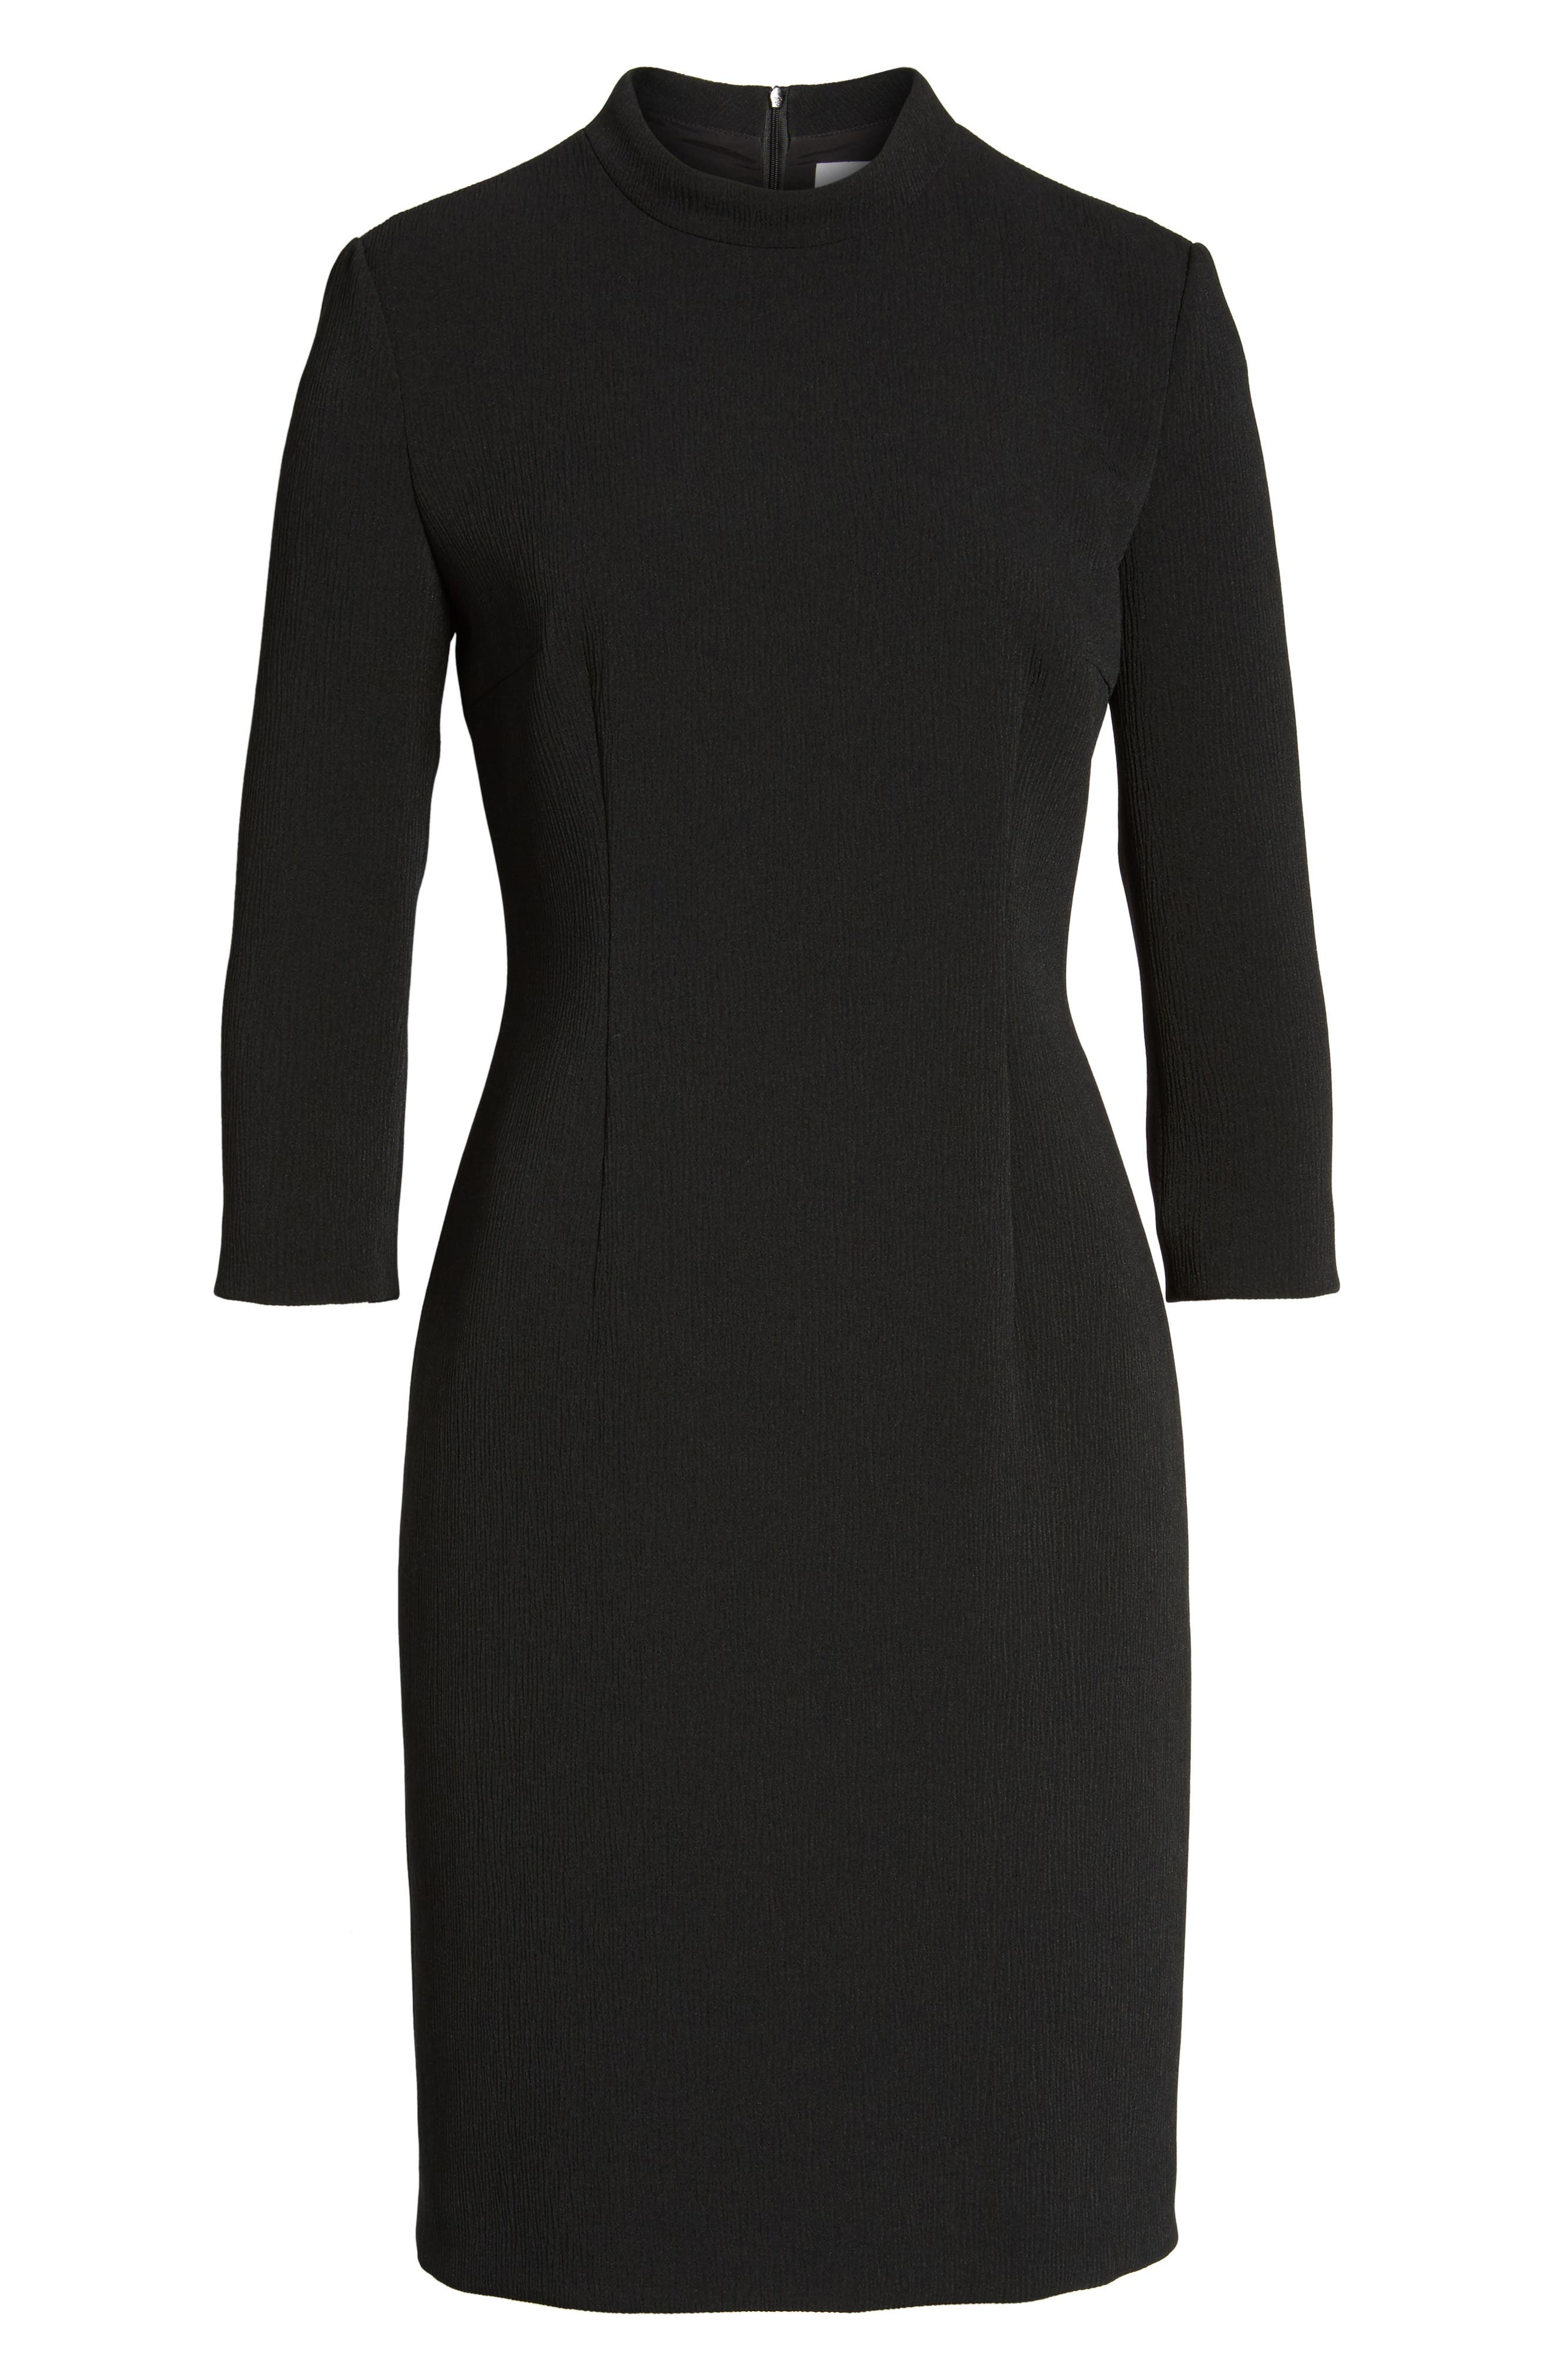 Dadena Crepe Sheath Dress,                             Alternate thumbnail 6, color,                             001